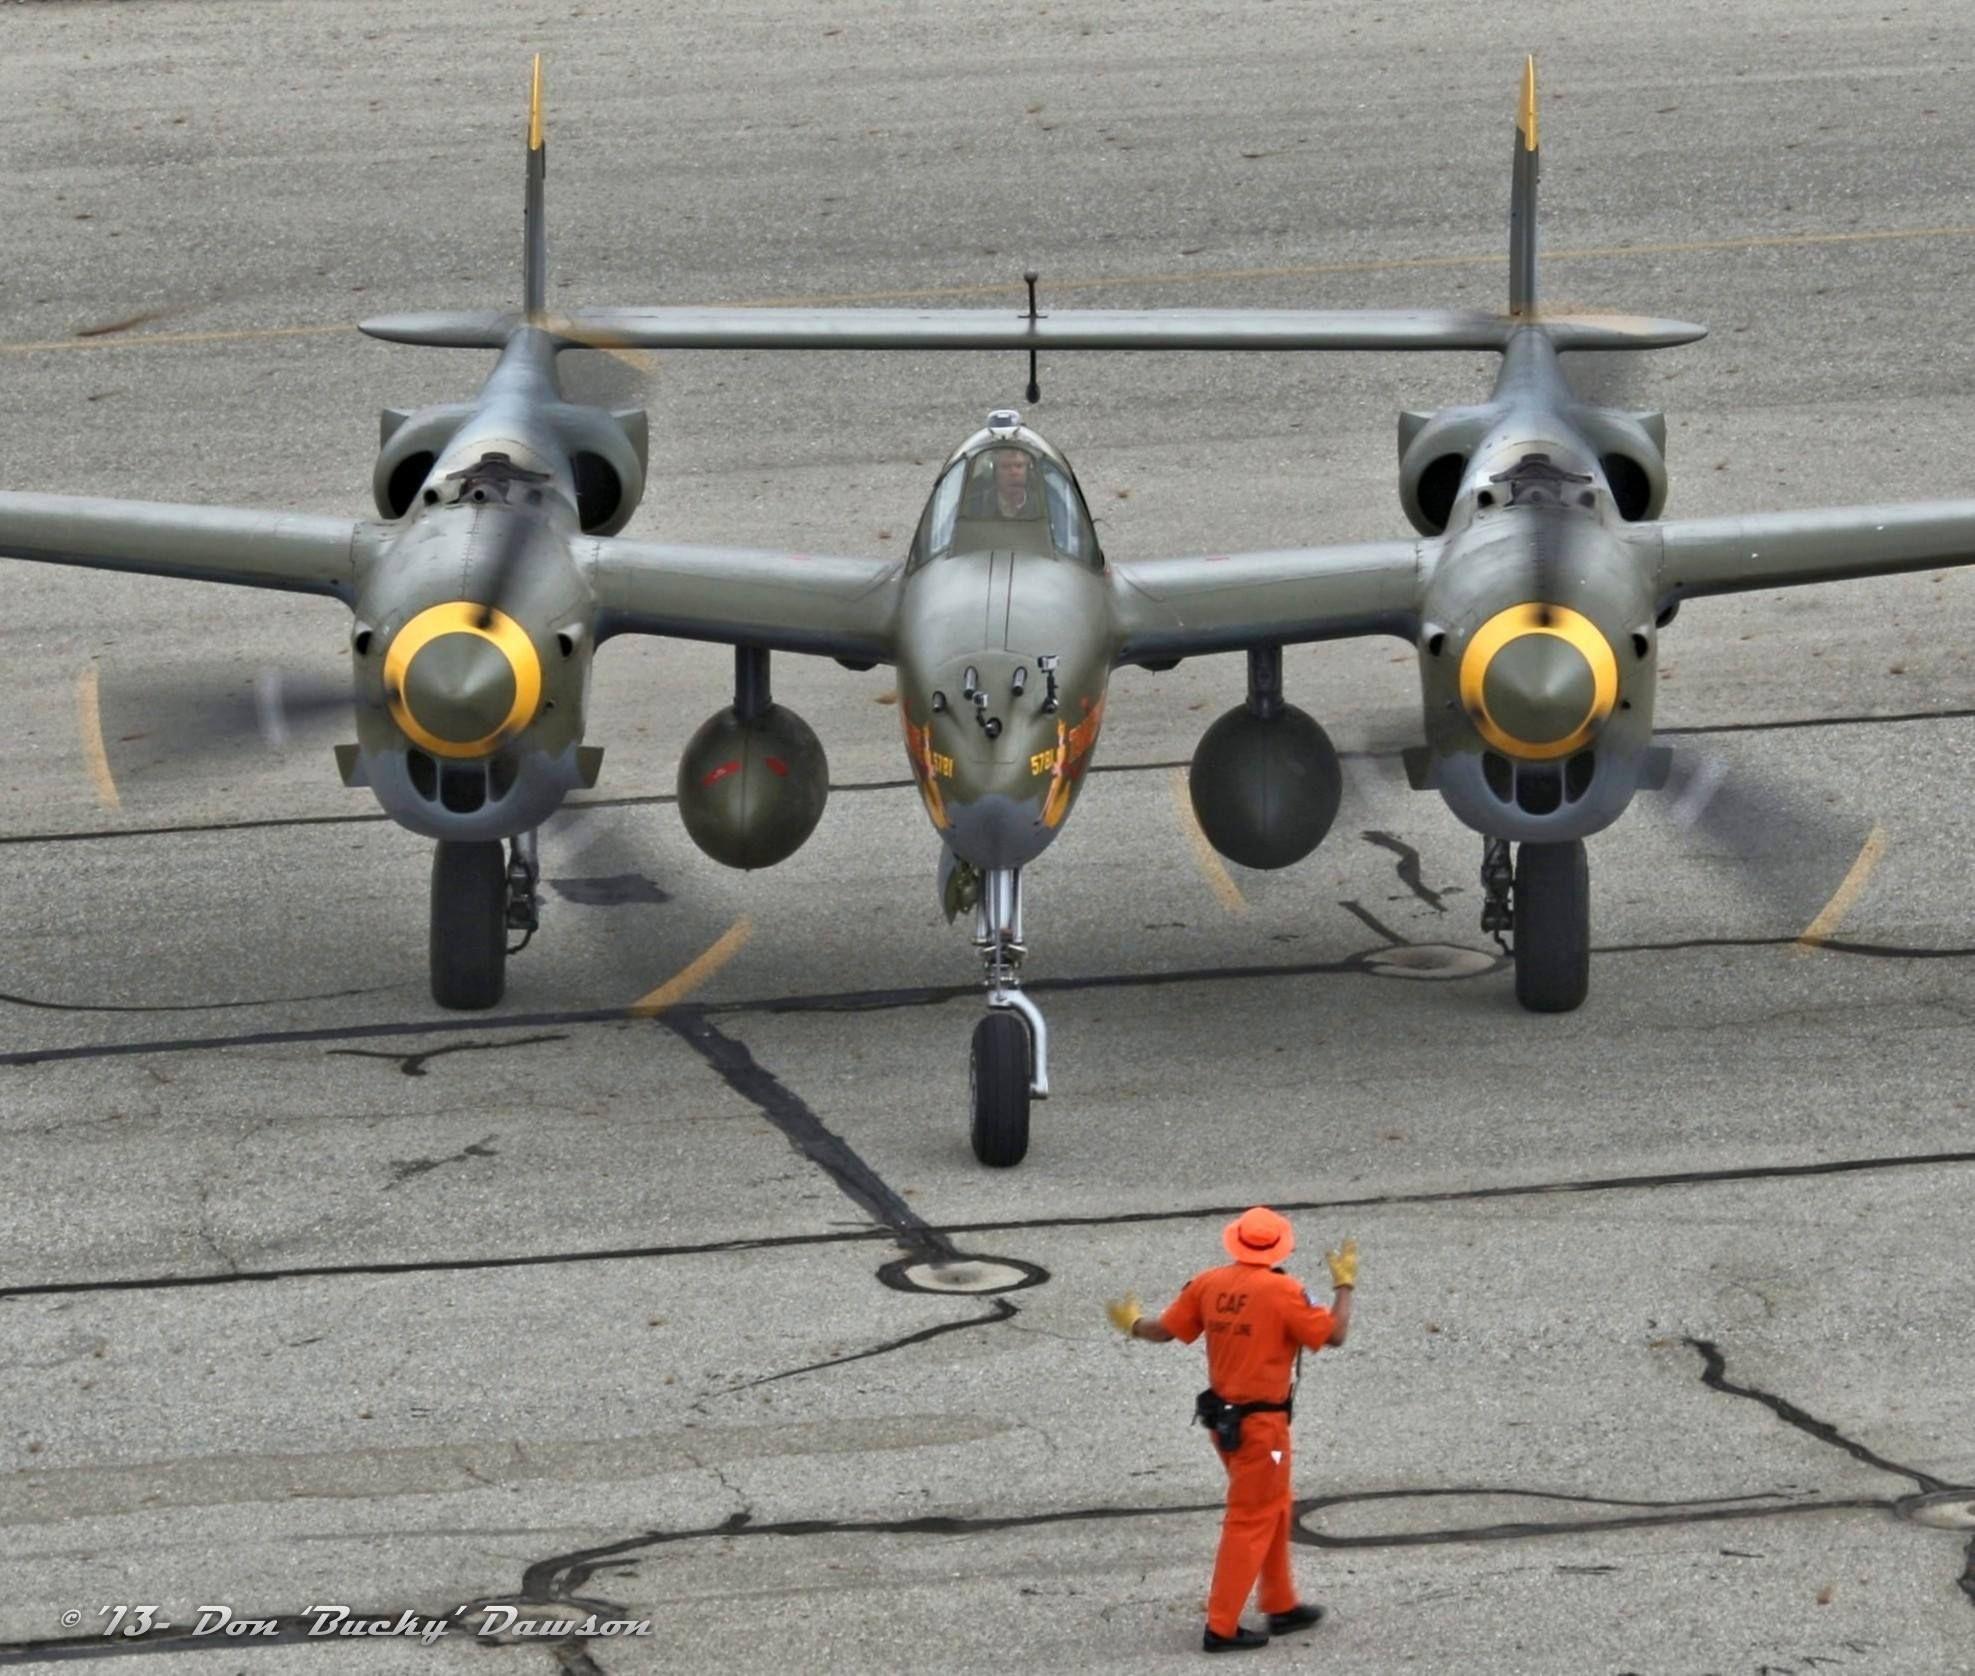 5/5/13Planes of Fame AirshowChino, CA Veteran warbird